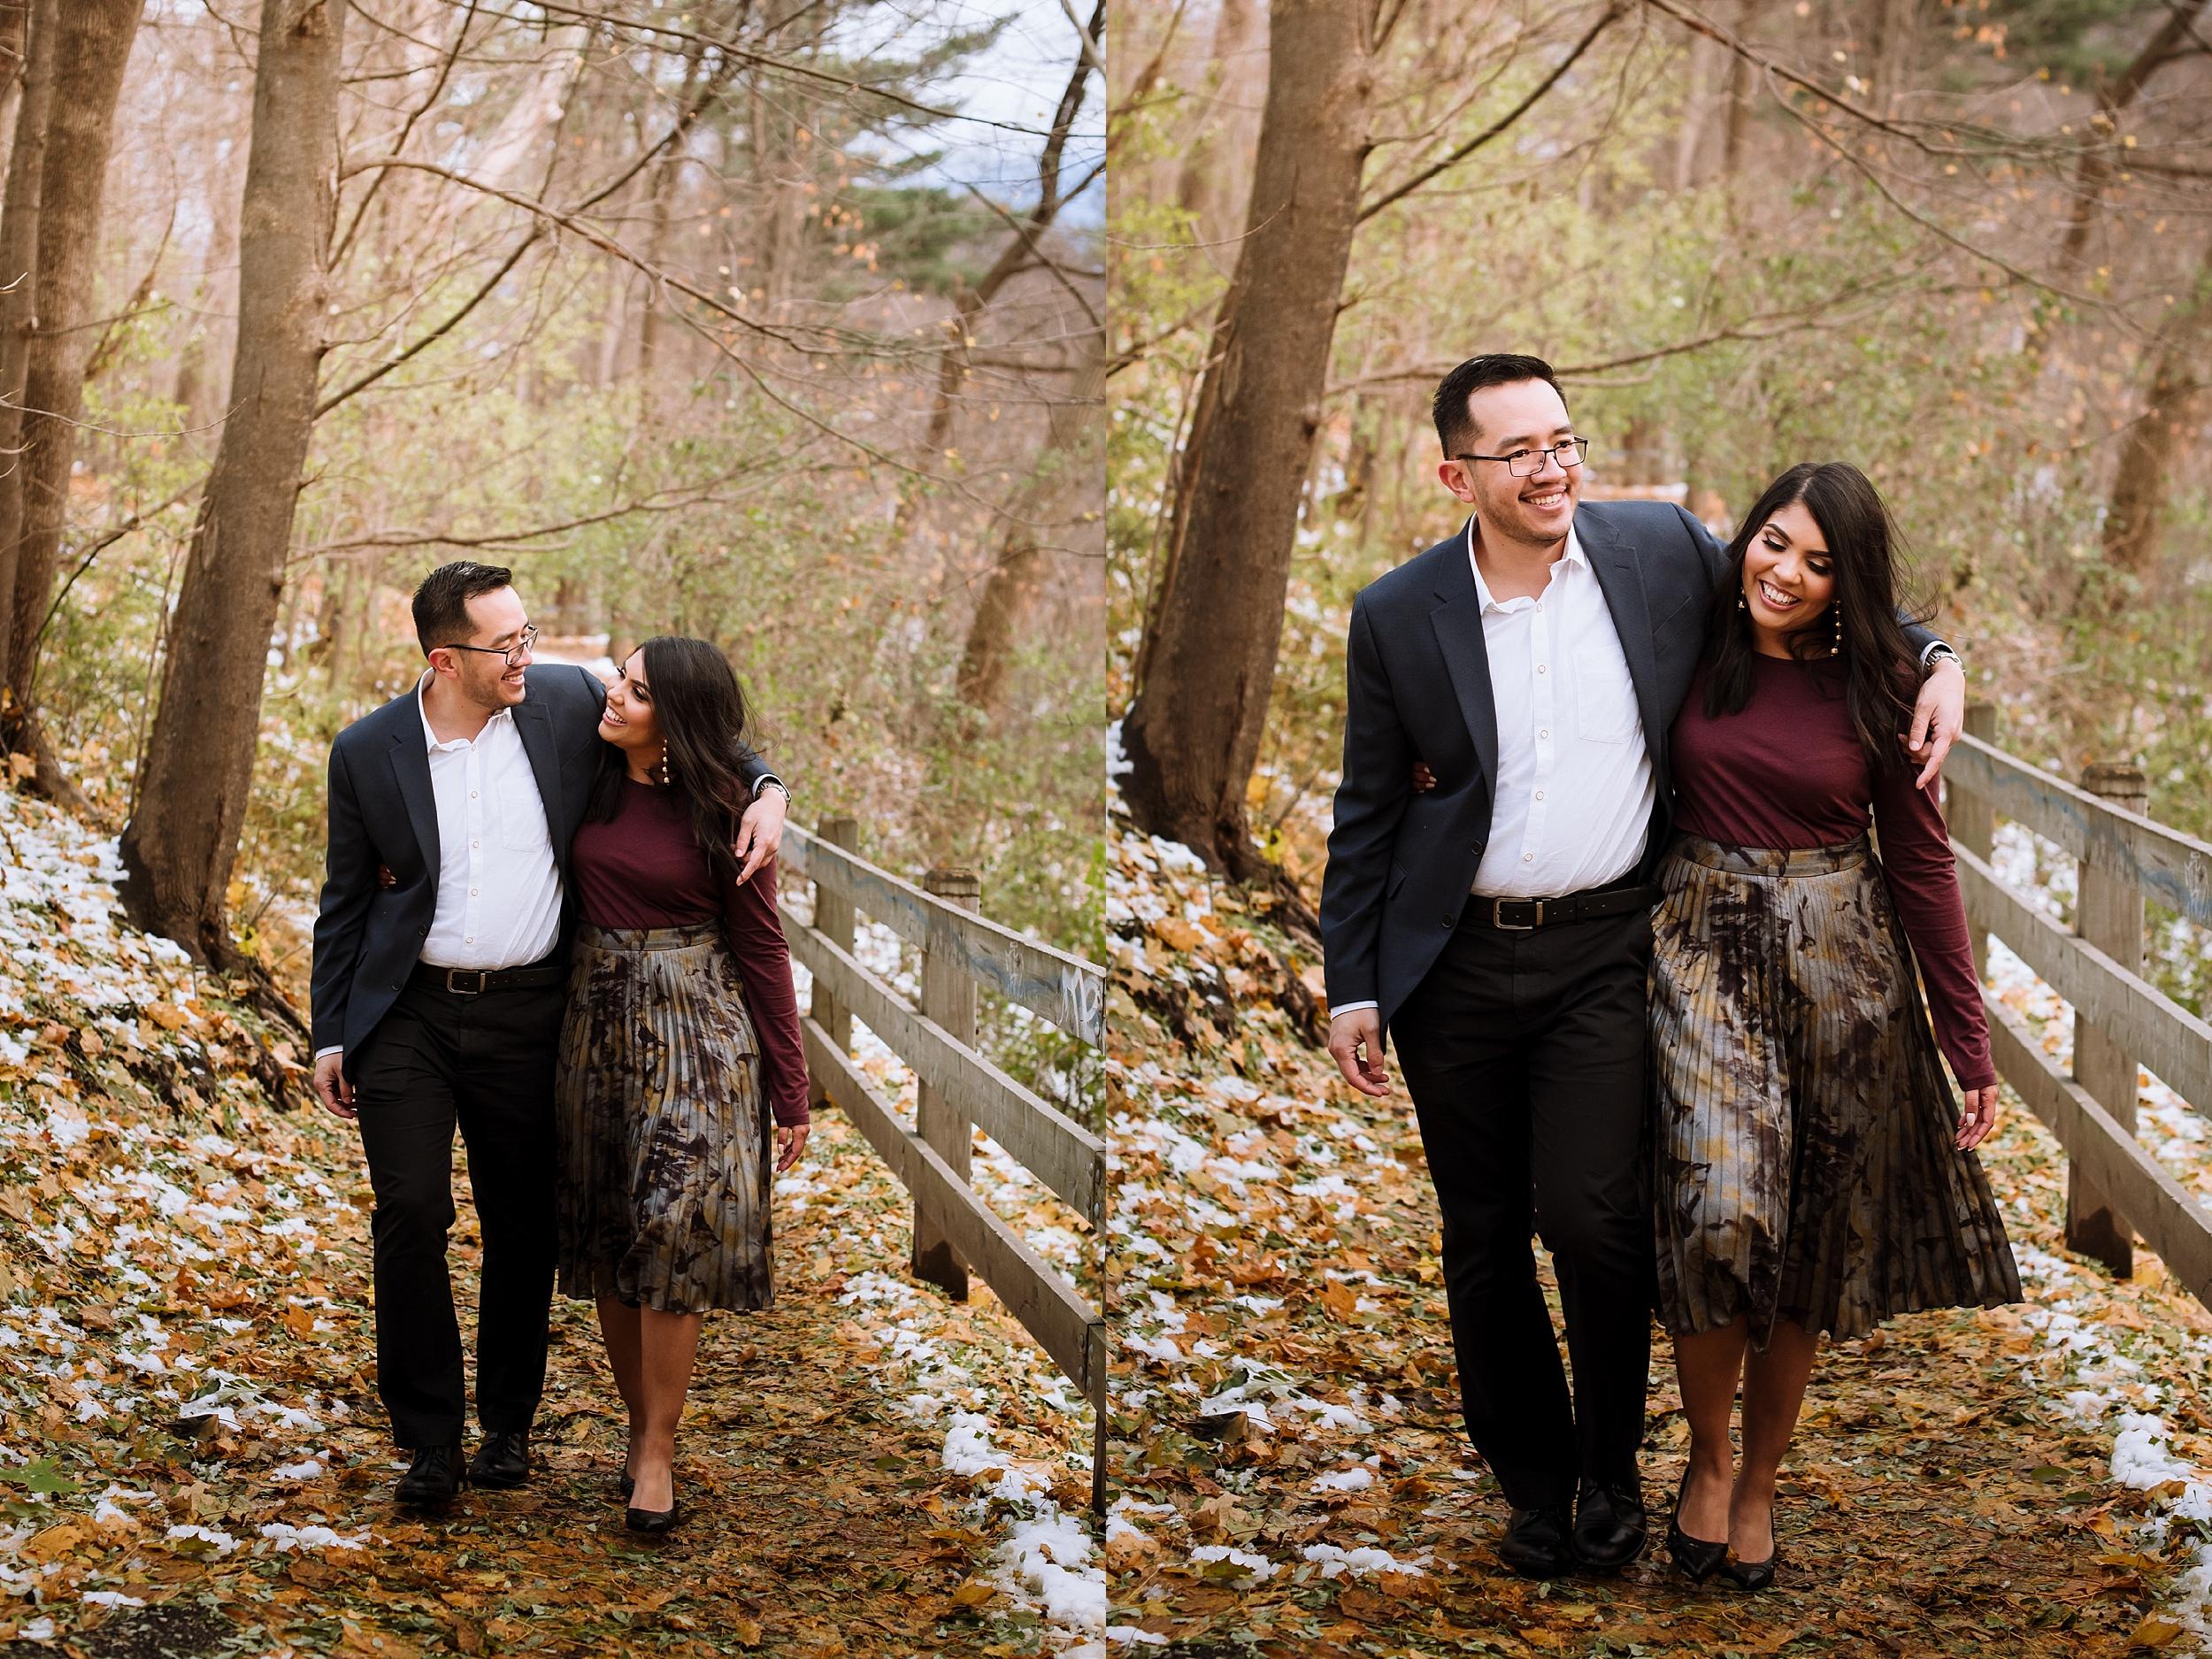 Alexander_Muir_Memorial_Gardens_Engagement_Shoot_Toronto_Wedding_Photographer_0024.jpg